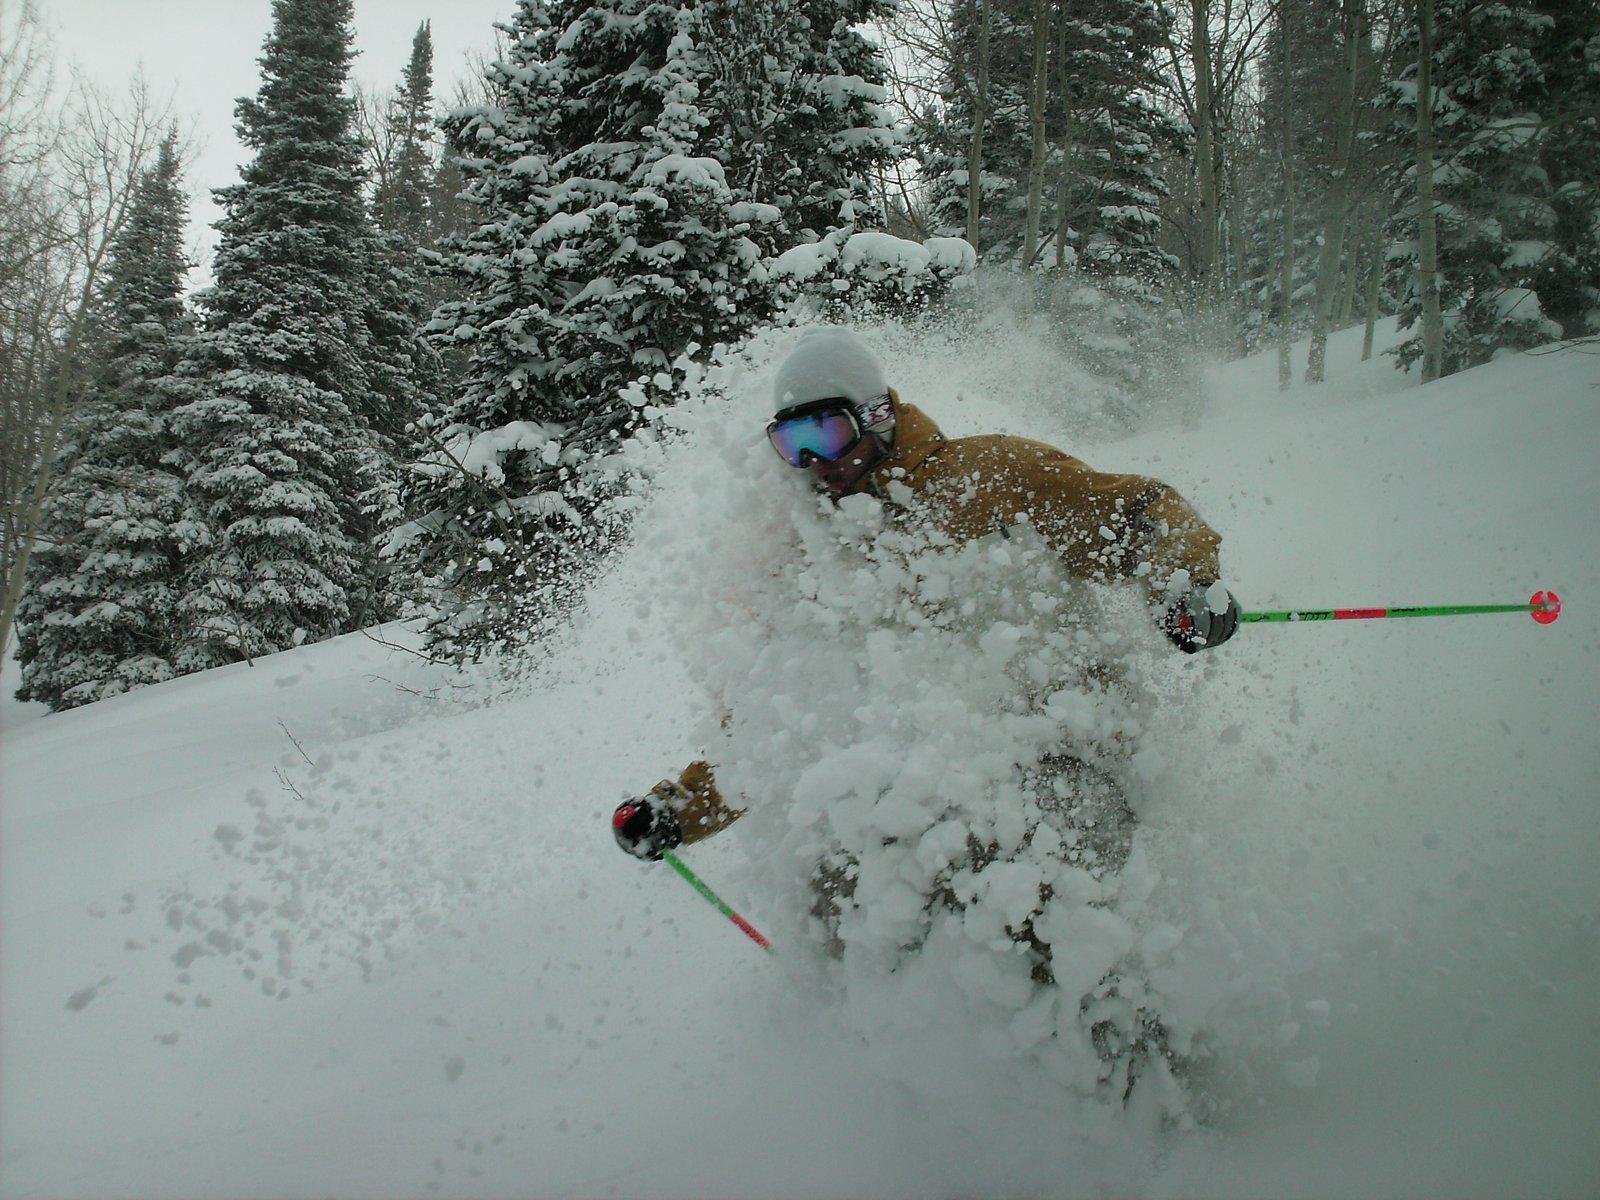 Powder yesterday at snowbasin